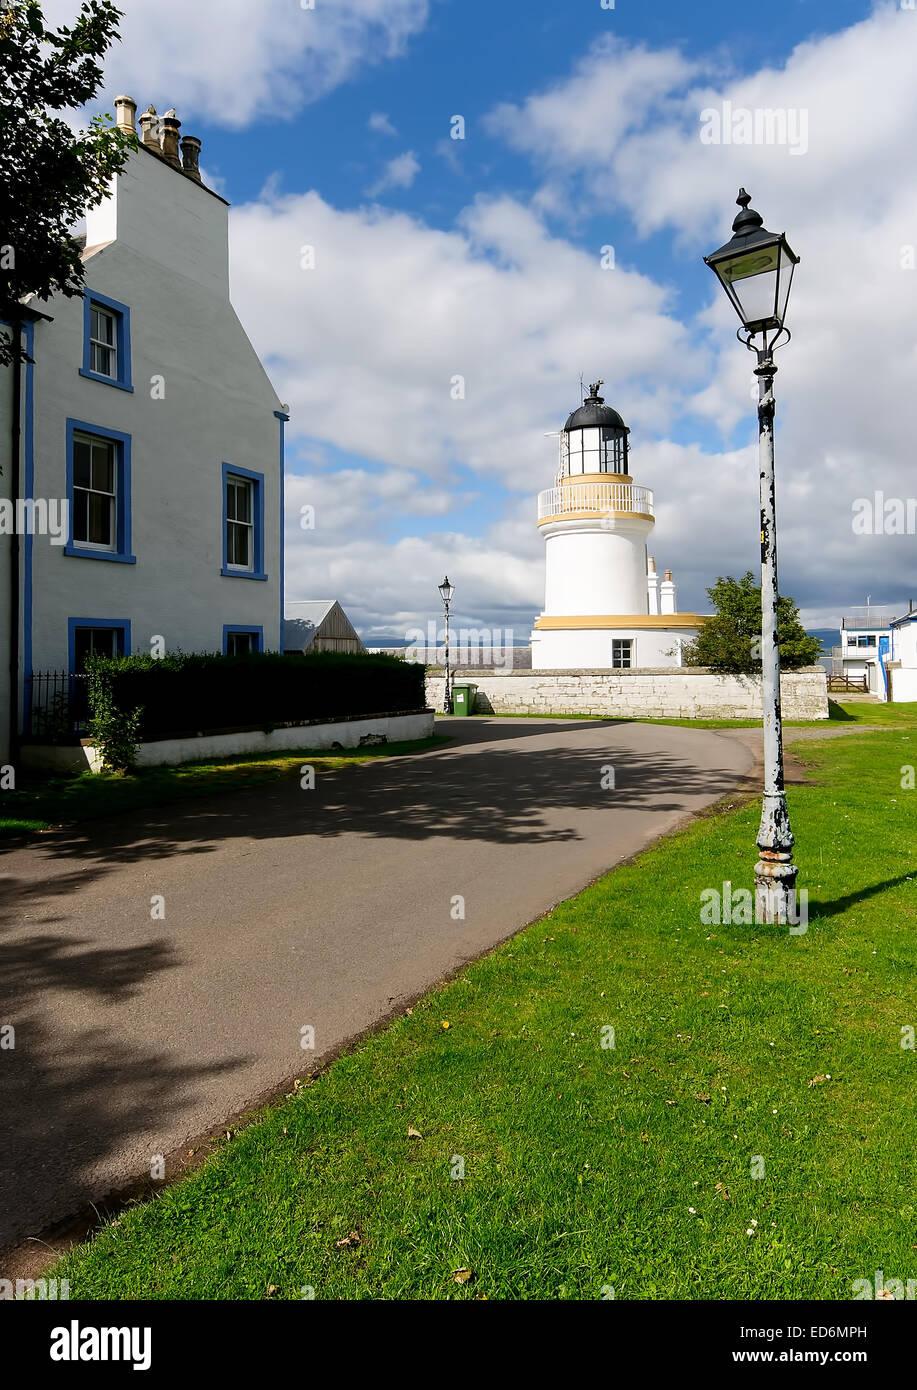 Cromarty on the Black Isle, Scotland Stock Photo